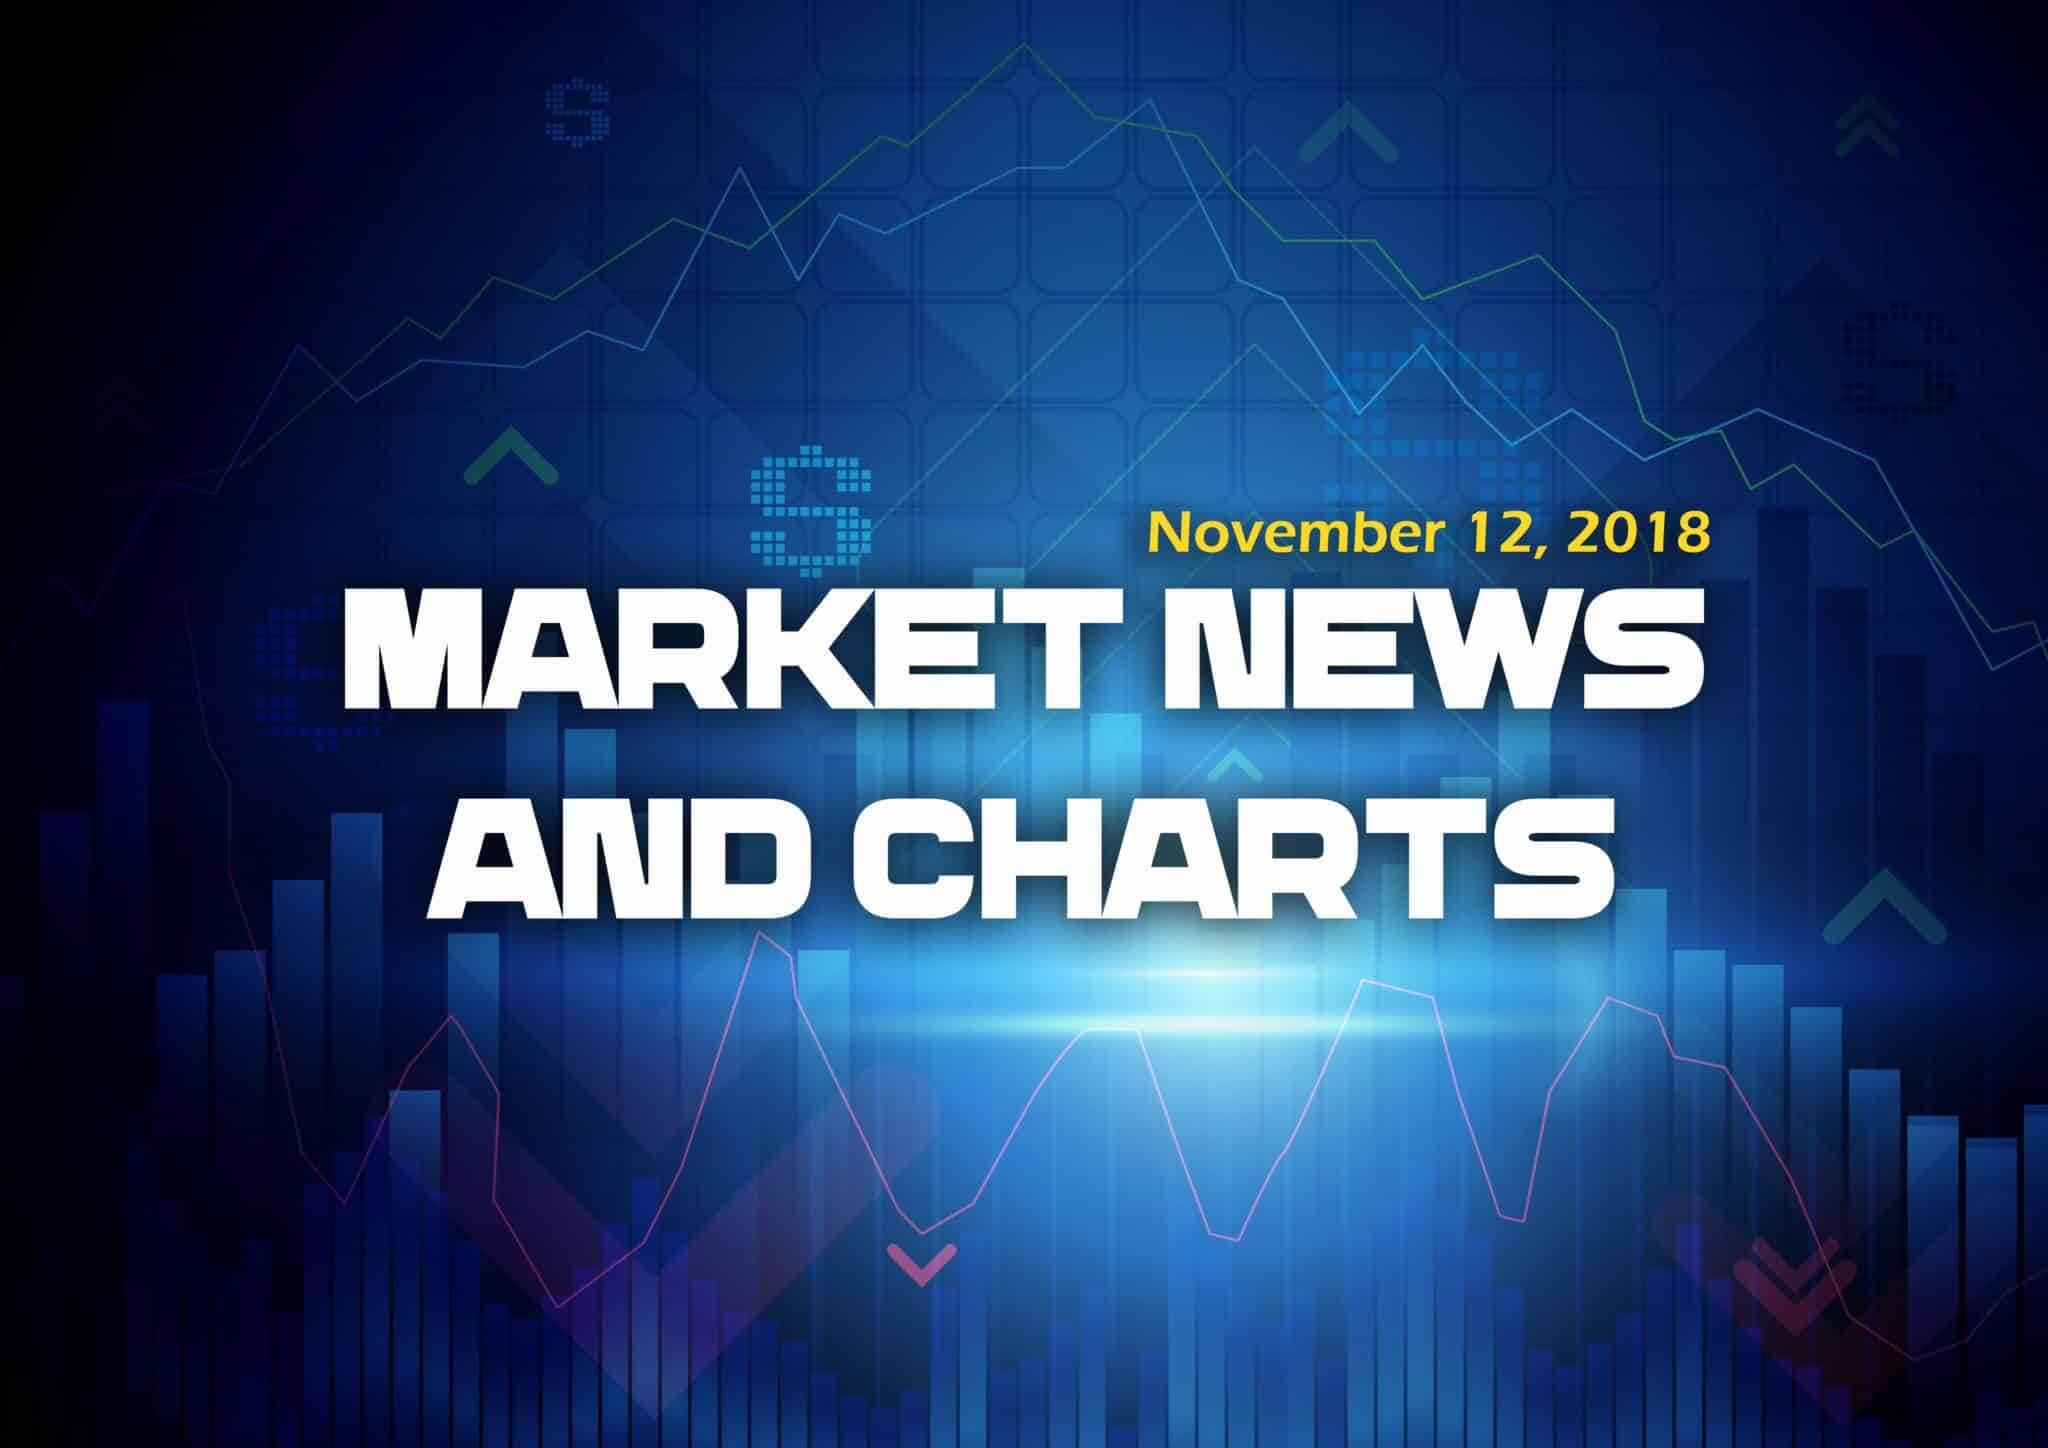 FinanceBrokerage - Market News and Charts November 12, 2018